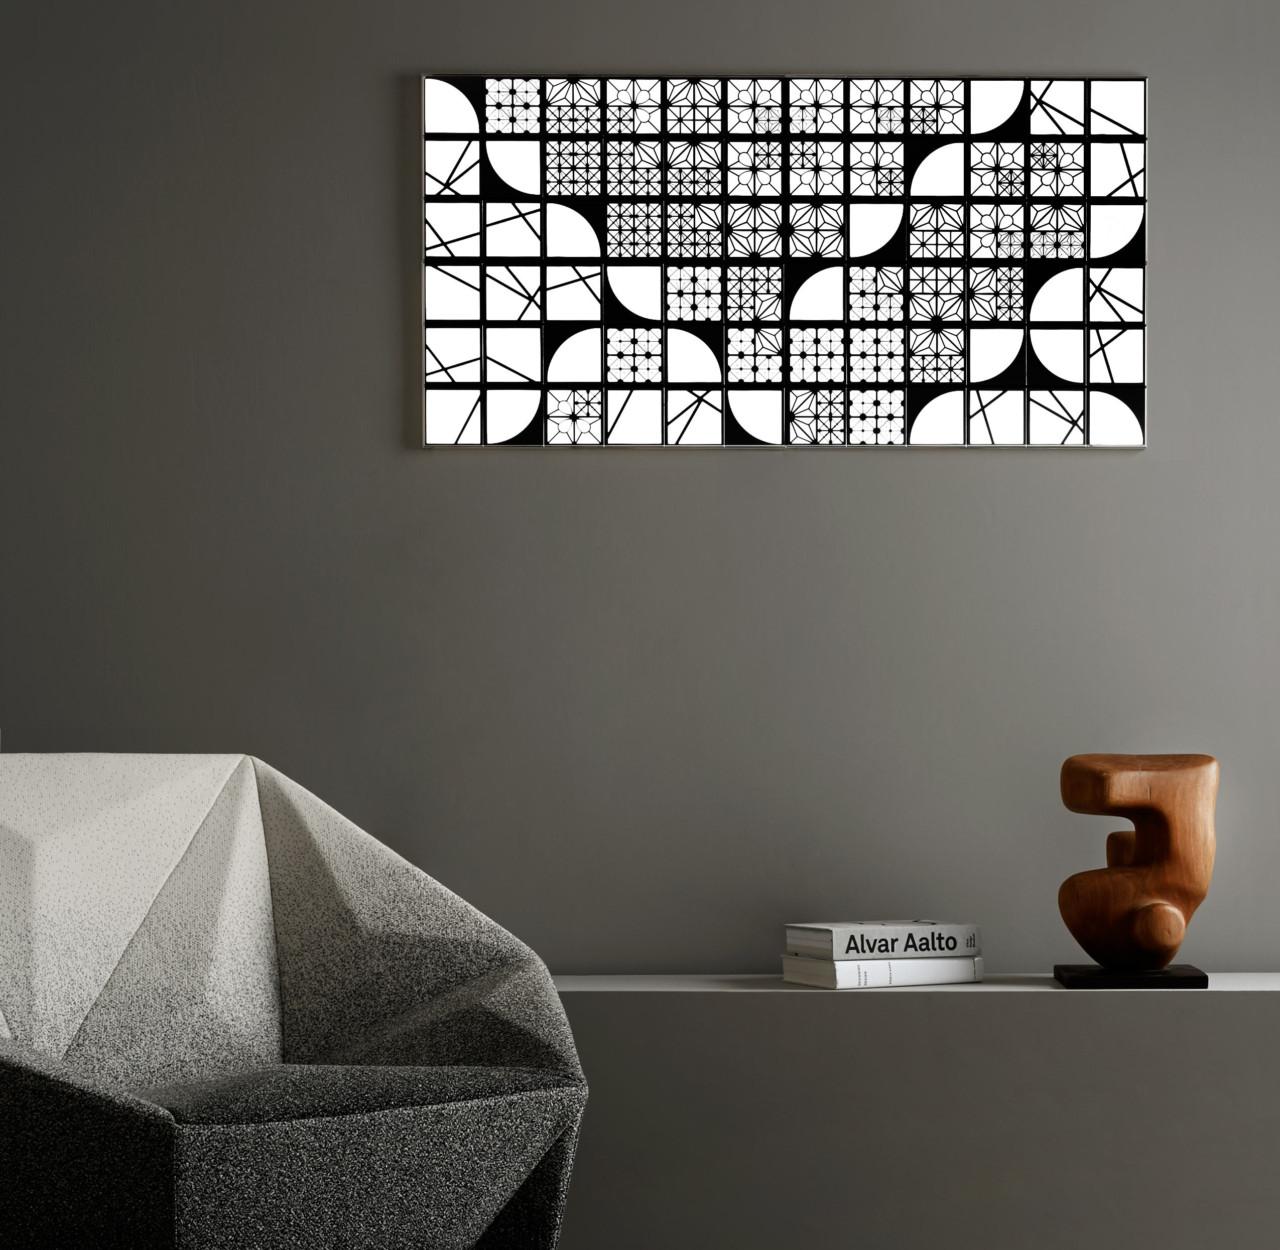 KUMIKO OLED Modular Lighting Turns Off Into a Mirror